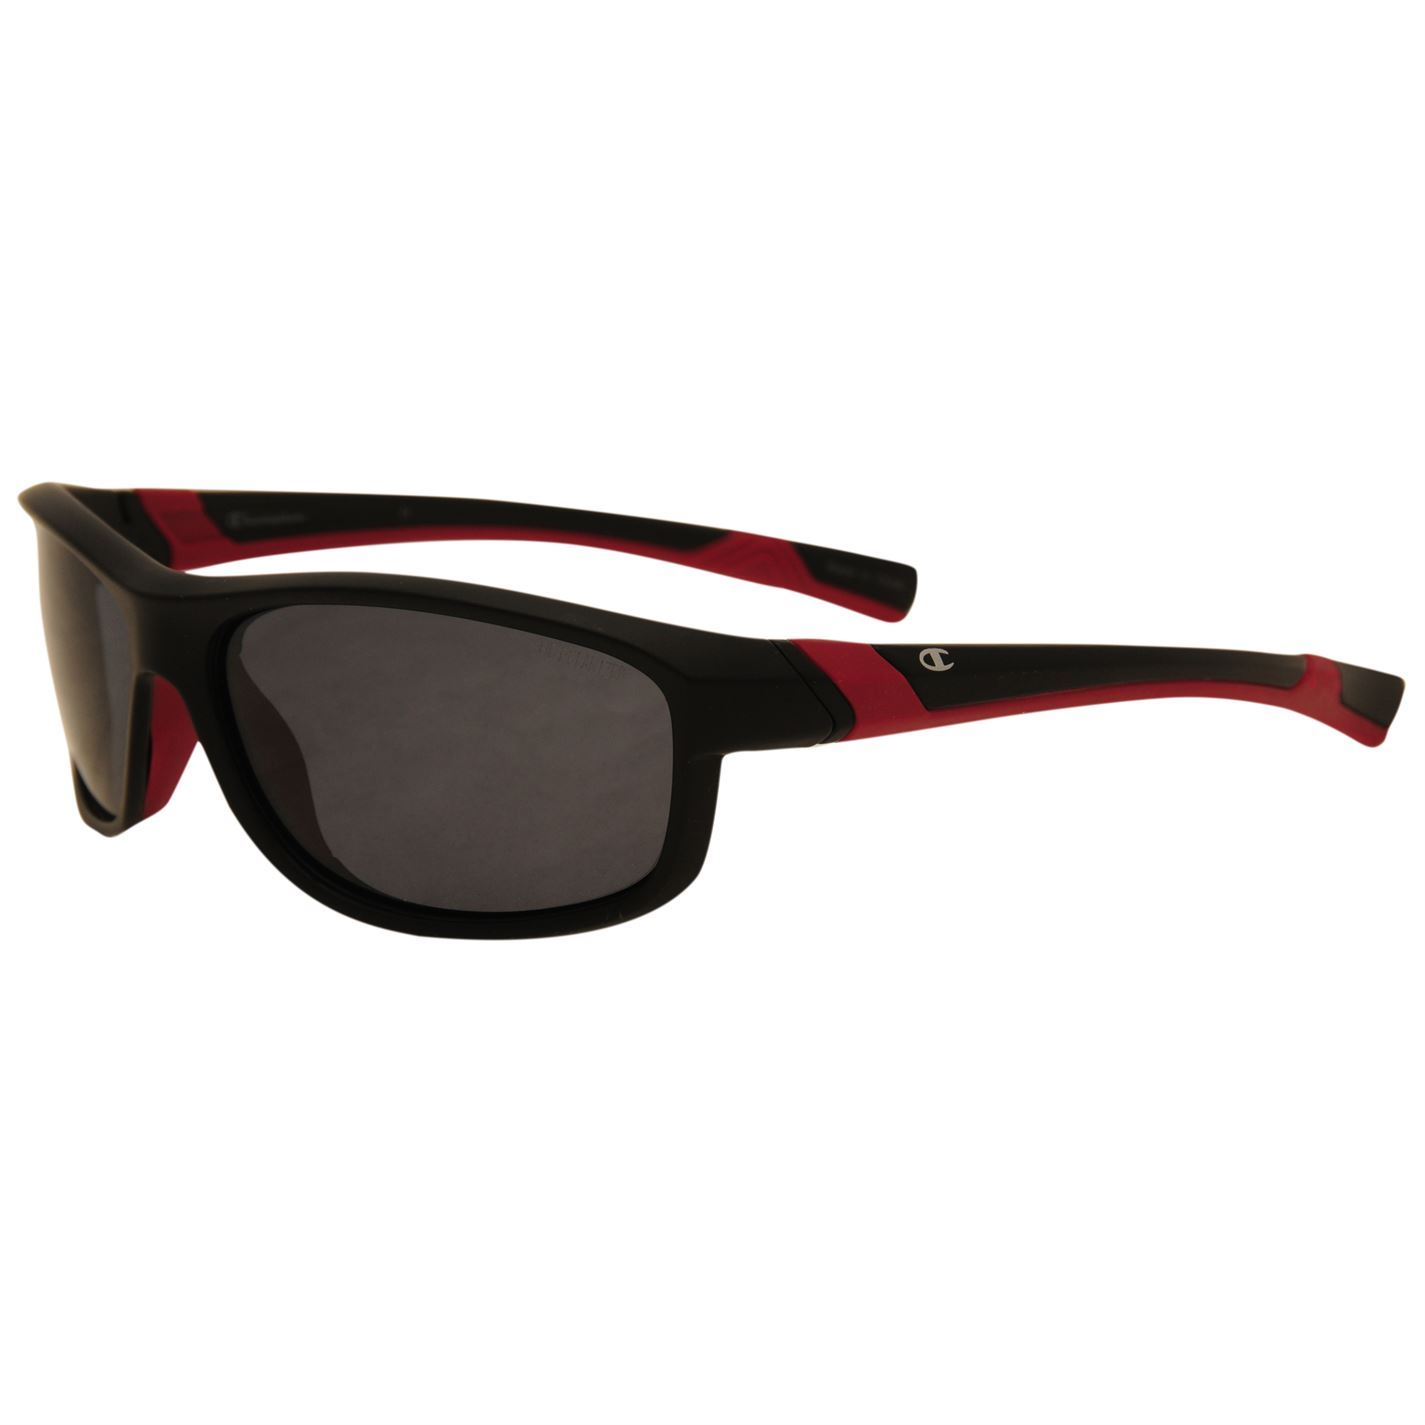 Mens-Champion-Polarized-Sunglasses-New